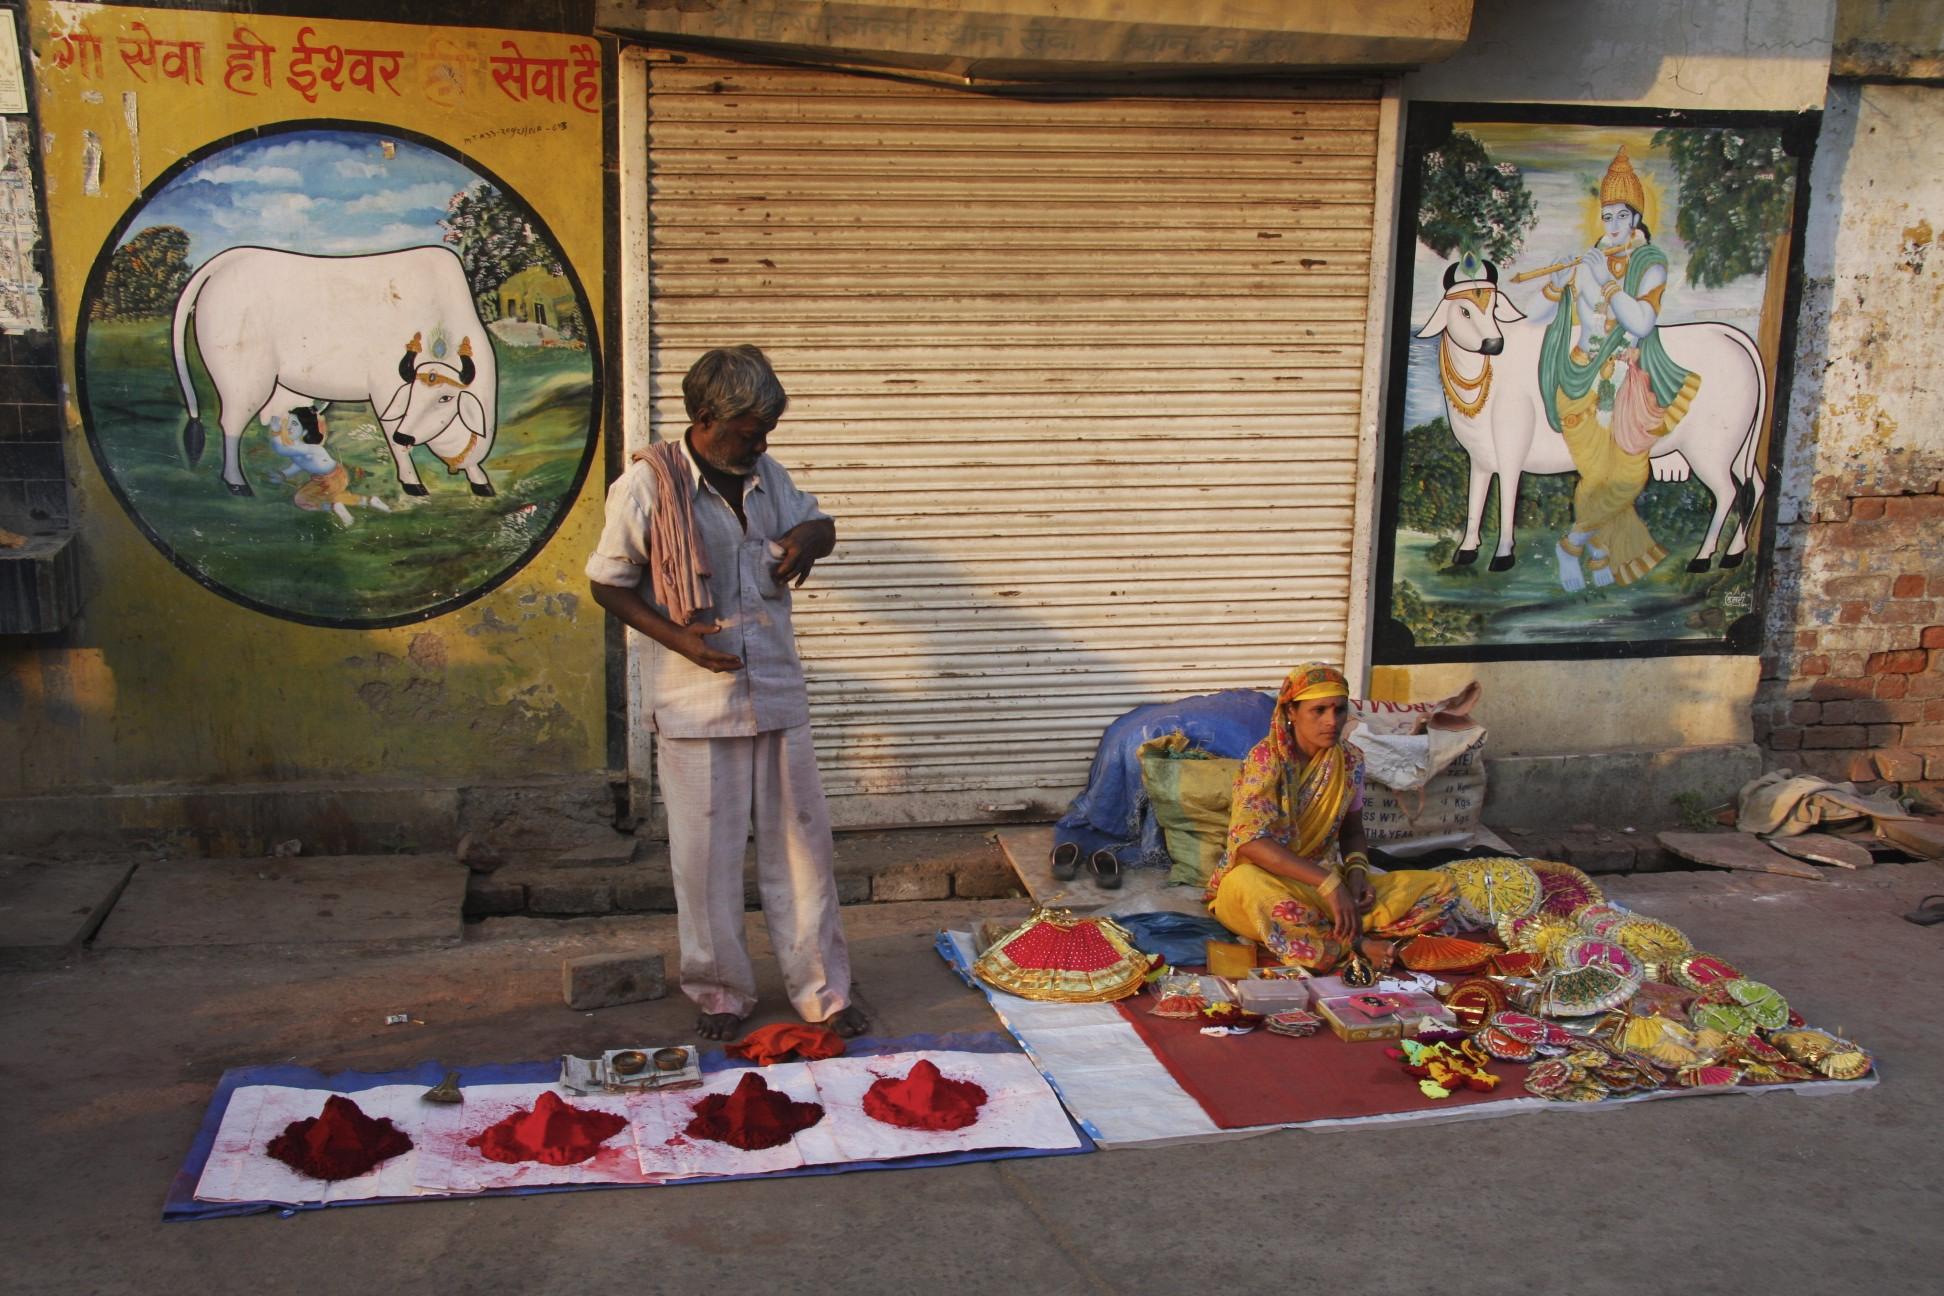 Matura, selling tika